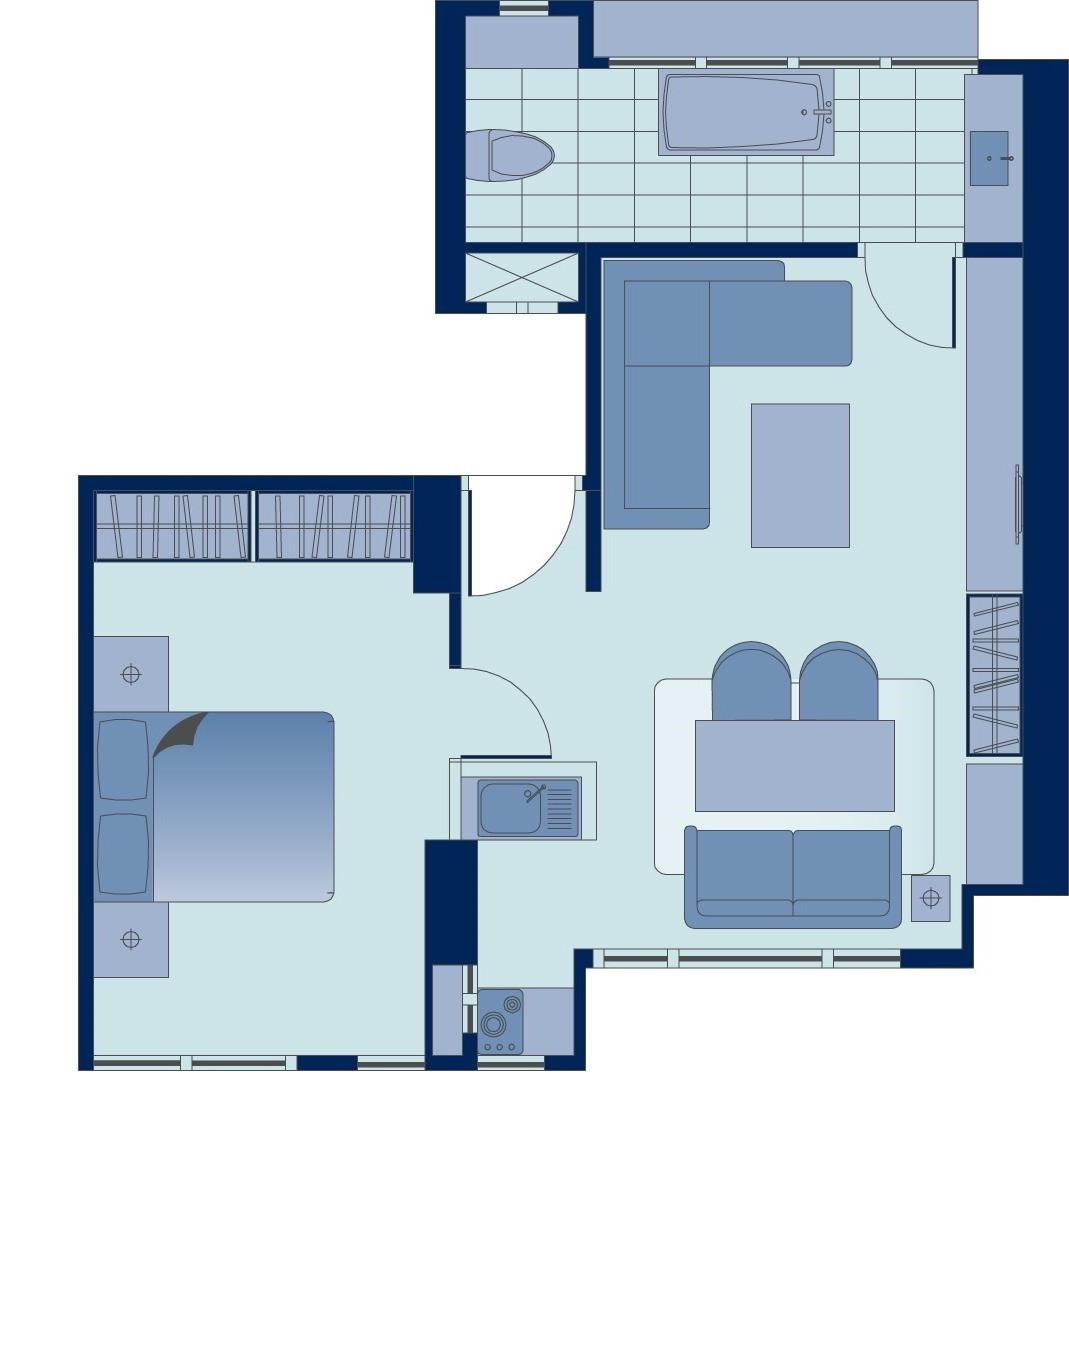 Floor plan 5 at Peel Street Central Apartments